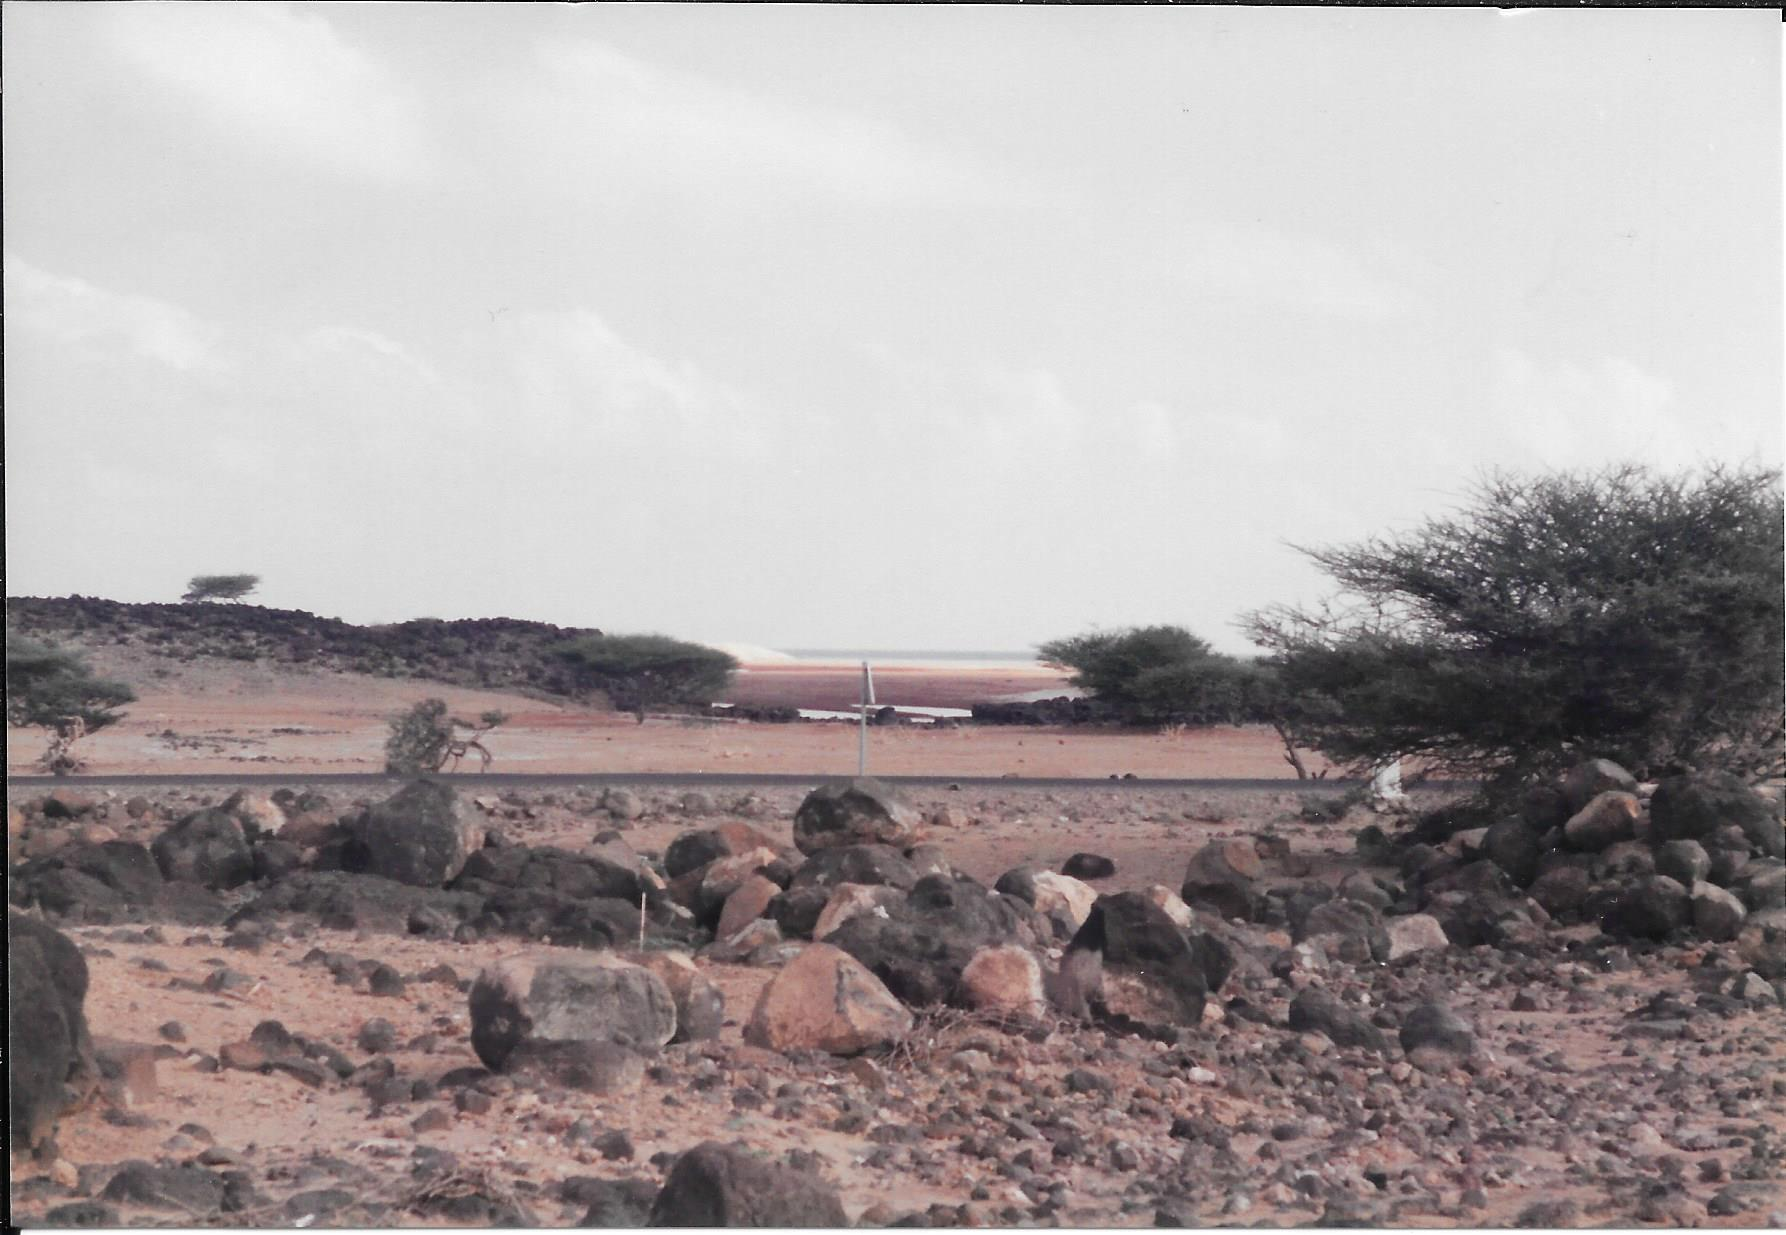 [Campagne] DJIBOUTI - TOME 1 - Page 22 312